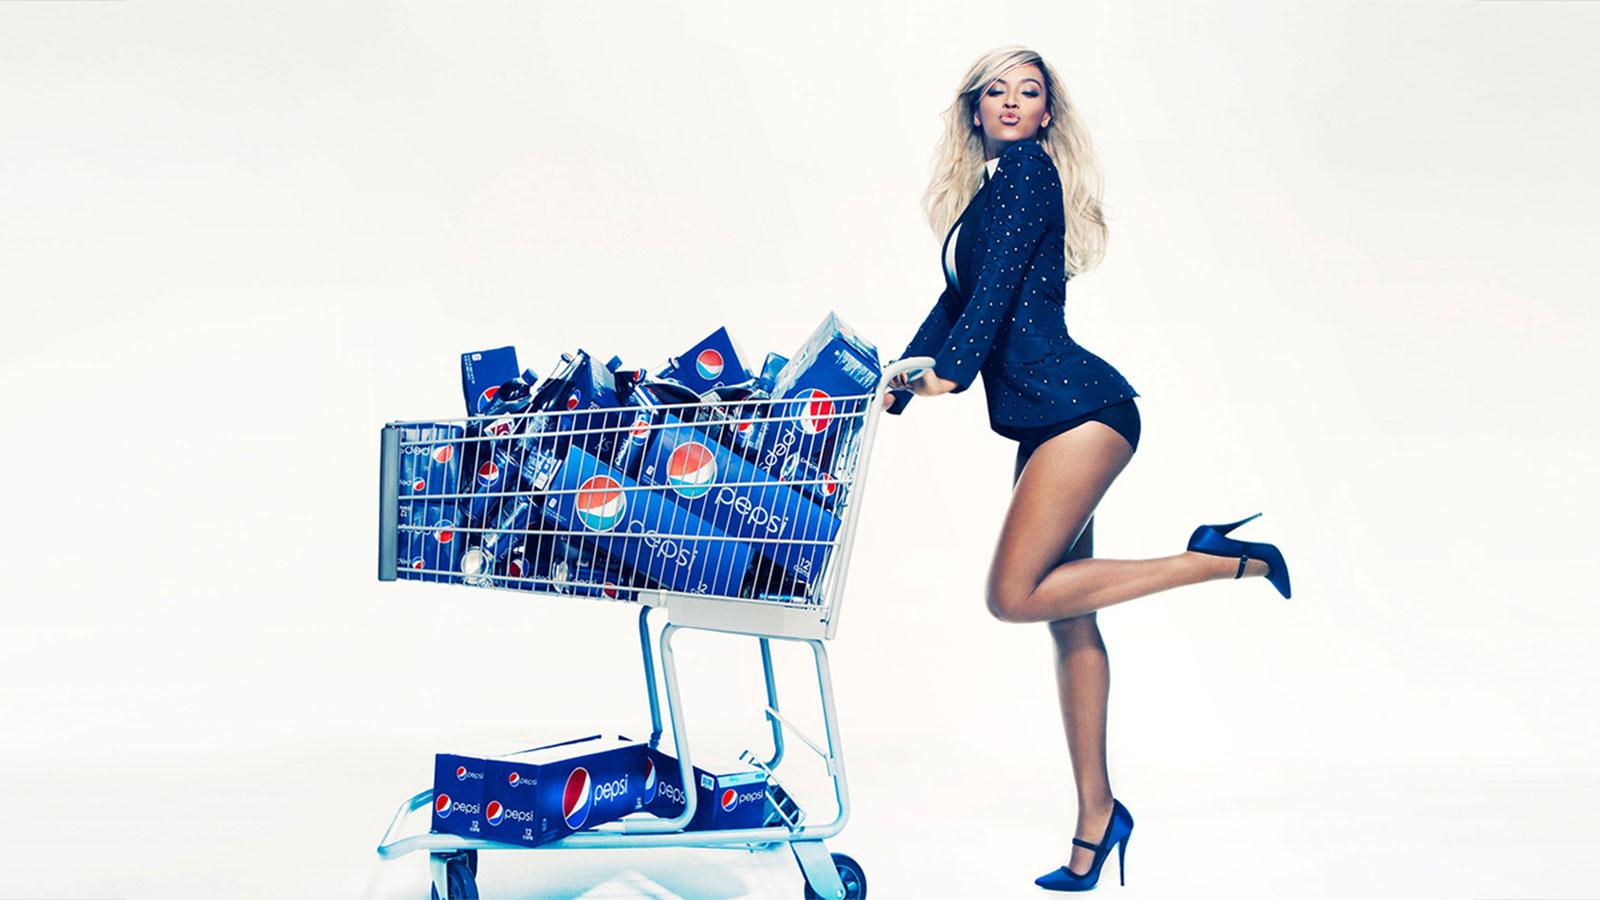 Beyonce & a shopping cart full of Pepsi